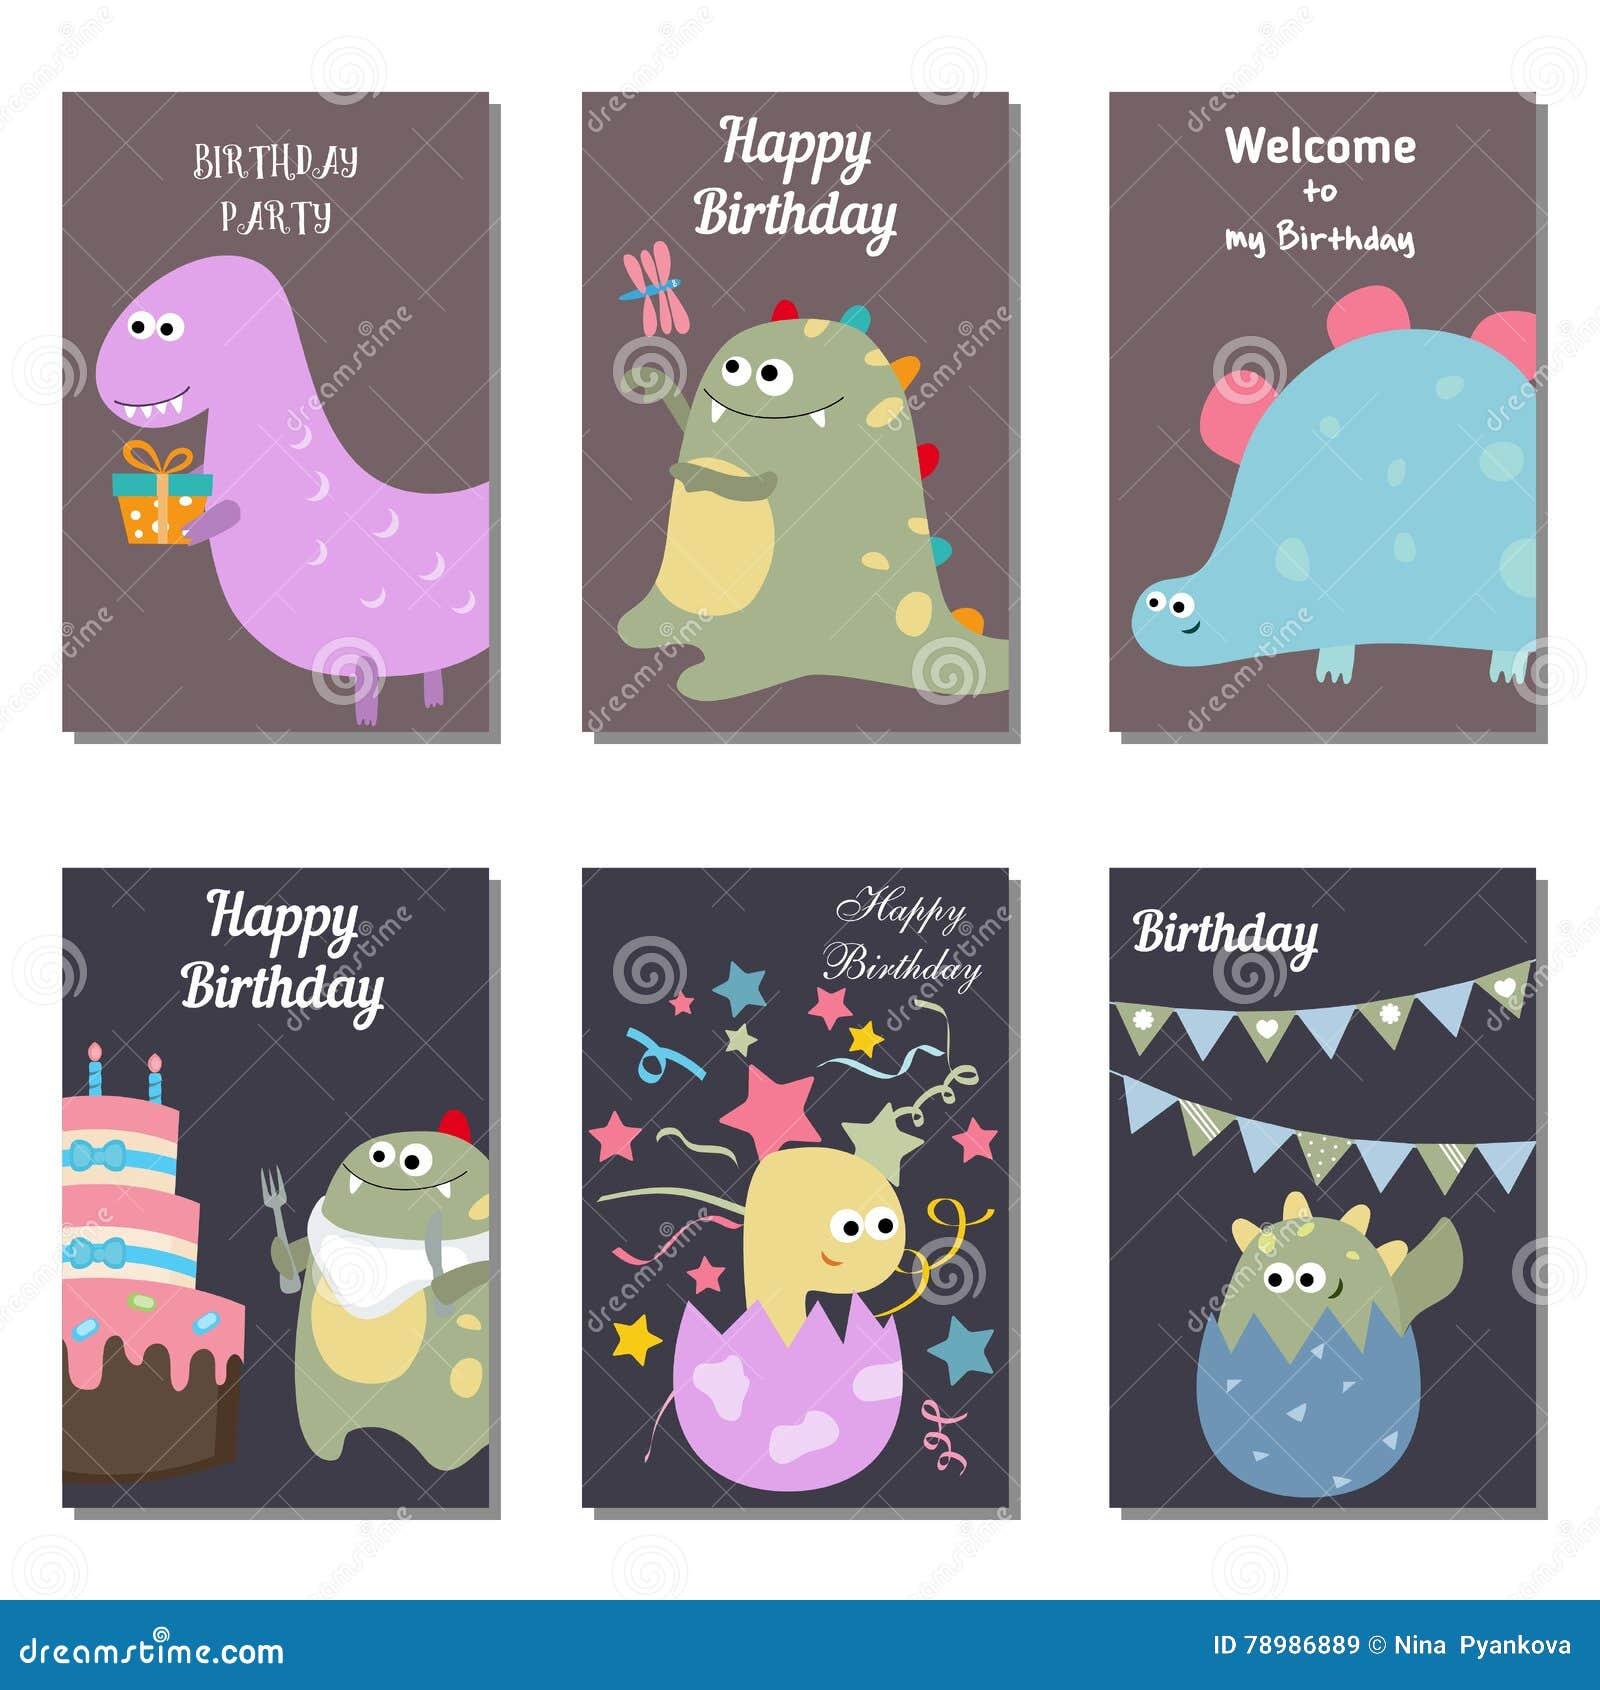 Set Of Beautiful Birthday Invitation Cards Decorated With Cute Cartoon Dinosaurs